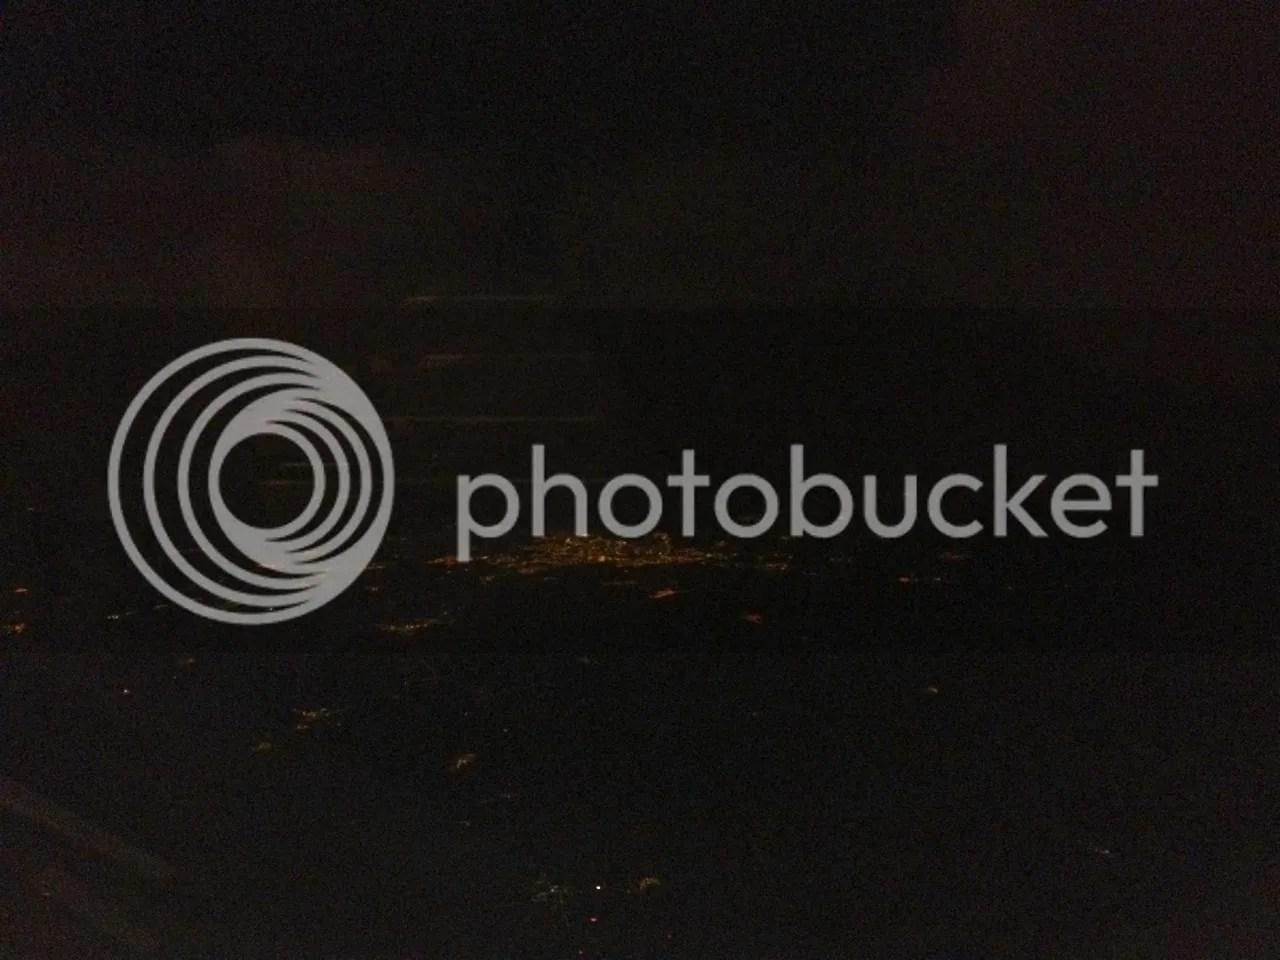 https://i1.wp.com/i181.photobucket.com/albums/x35/jwhite9185/Madrid/file-89.jpg